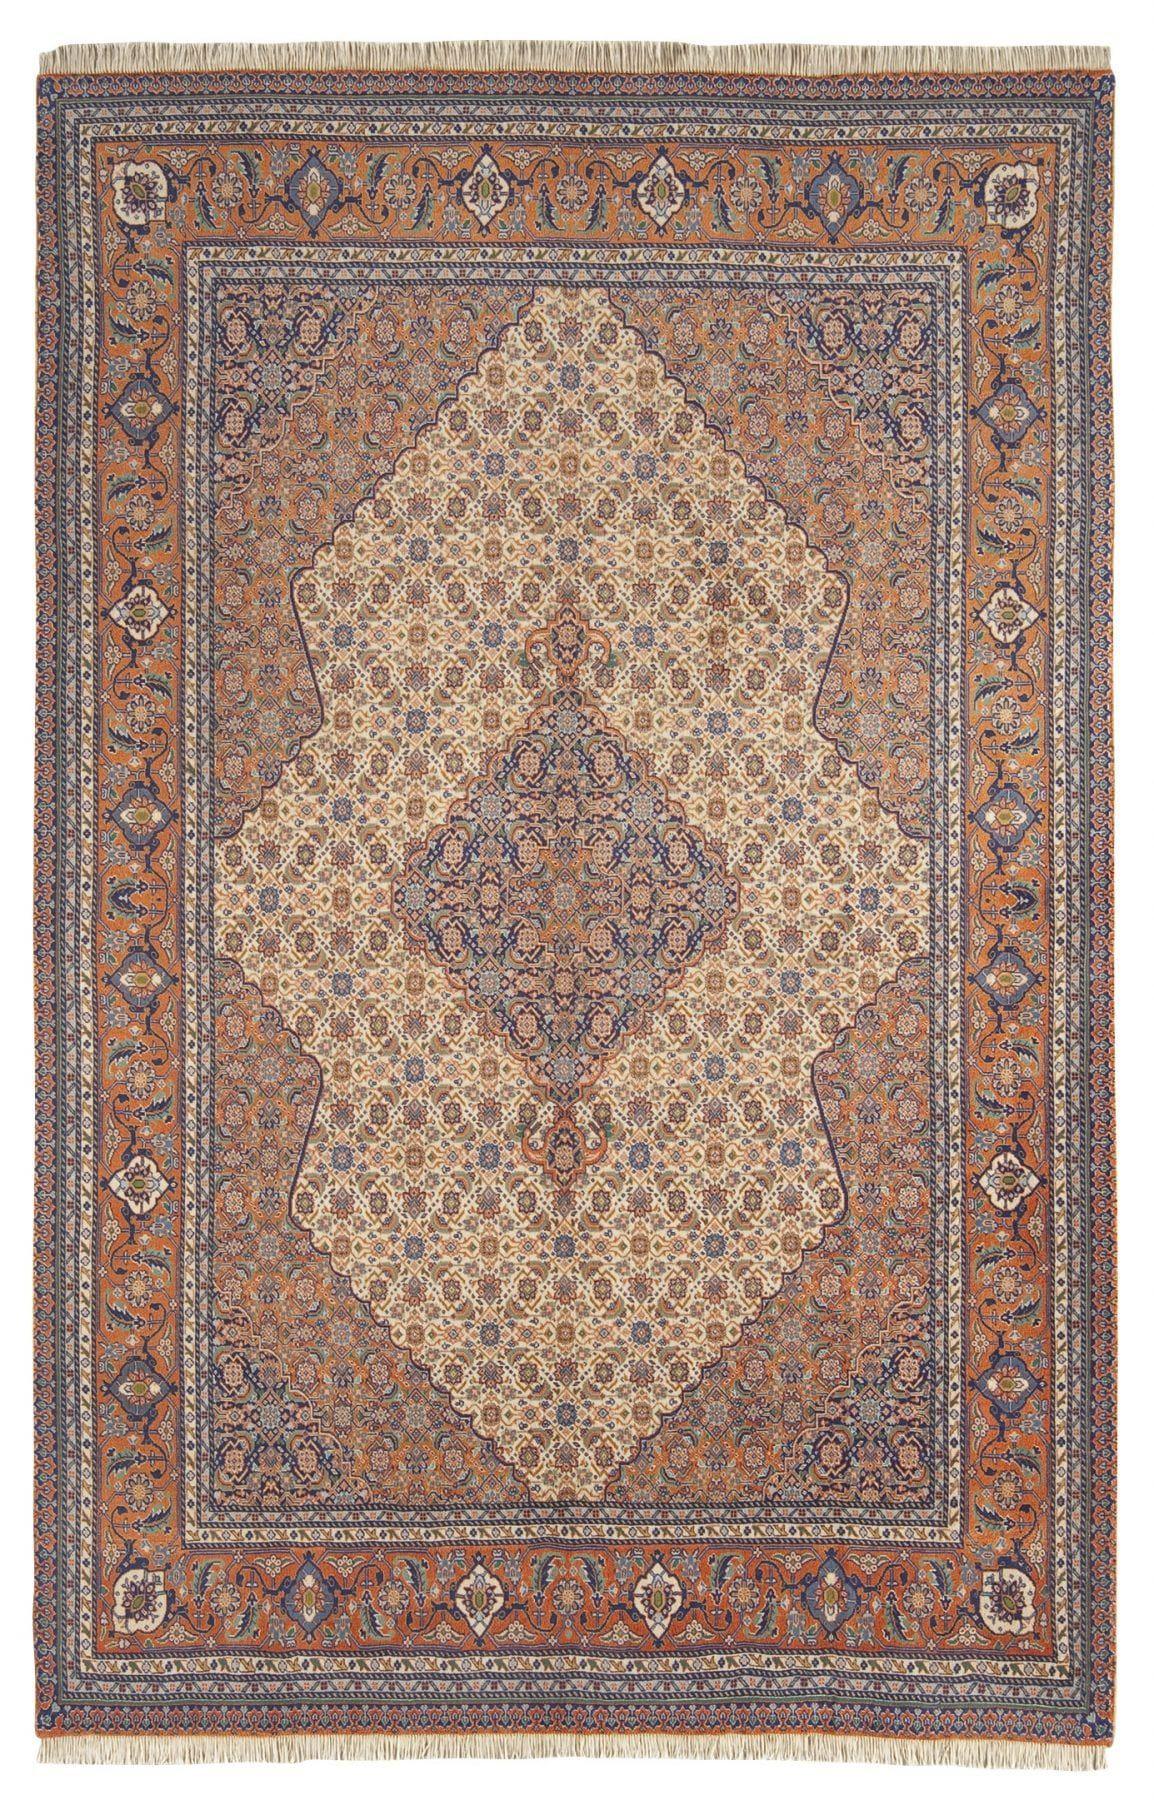 The London Persian Rug Company